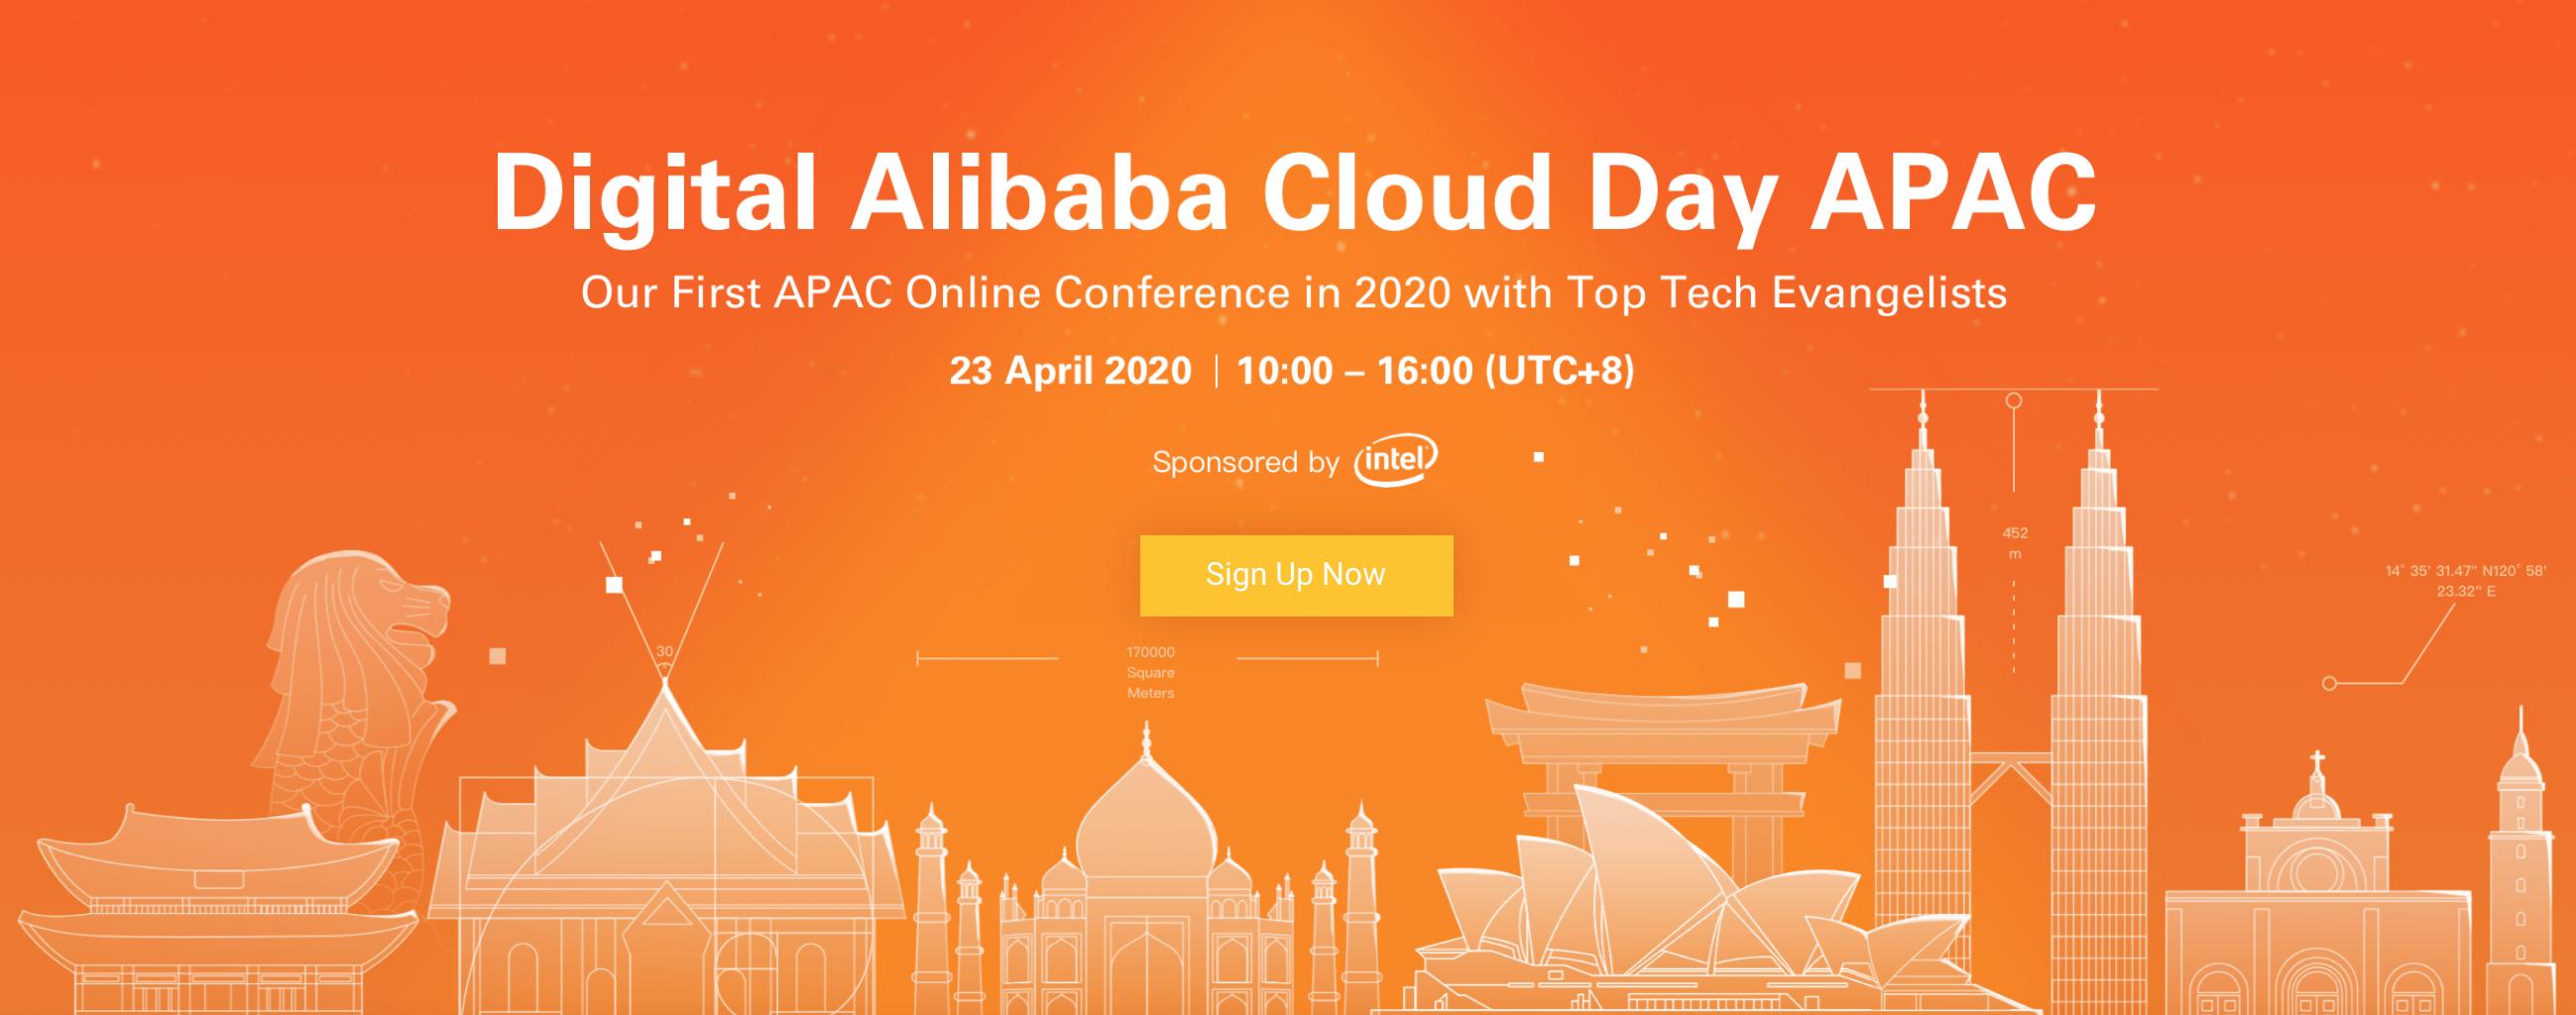 Digital Alibaba Cloud Day APAC